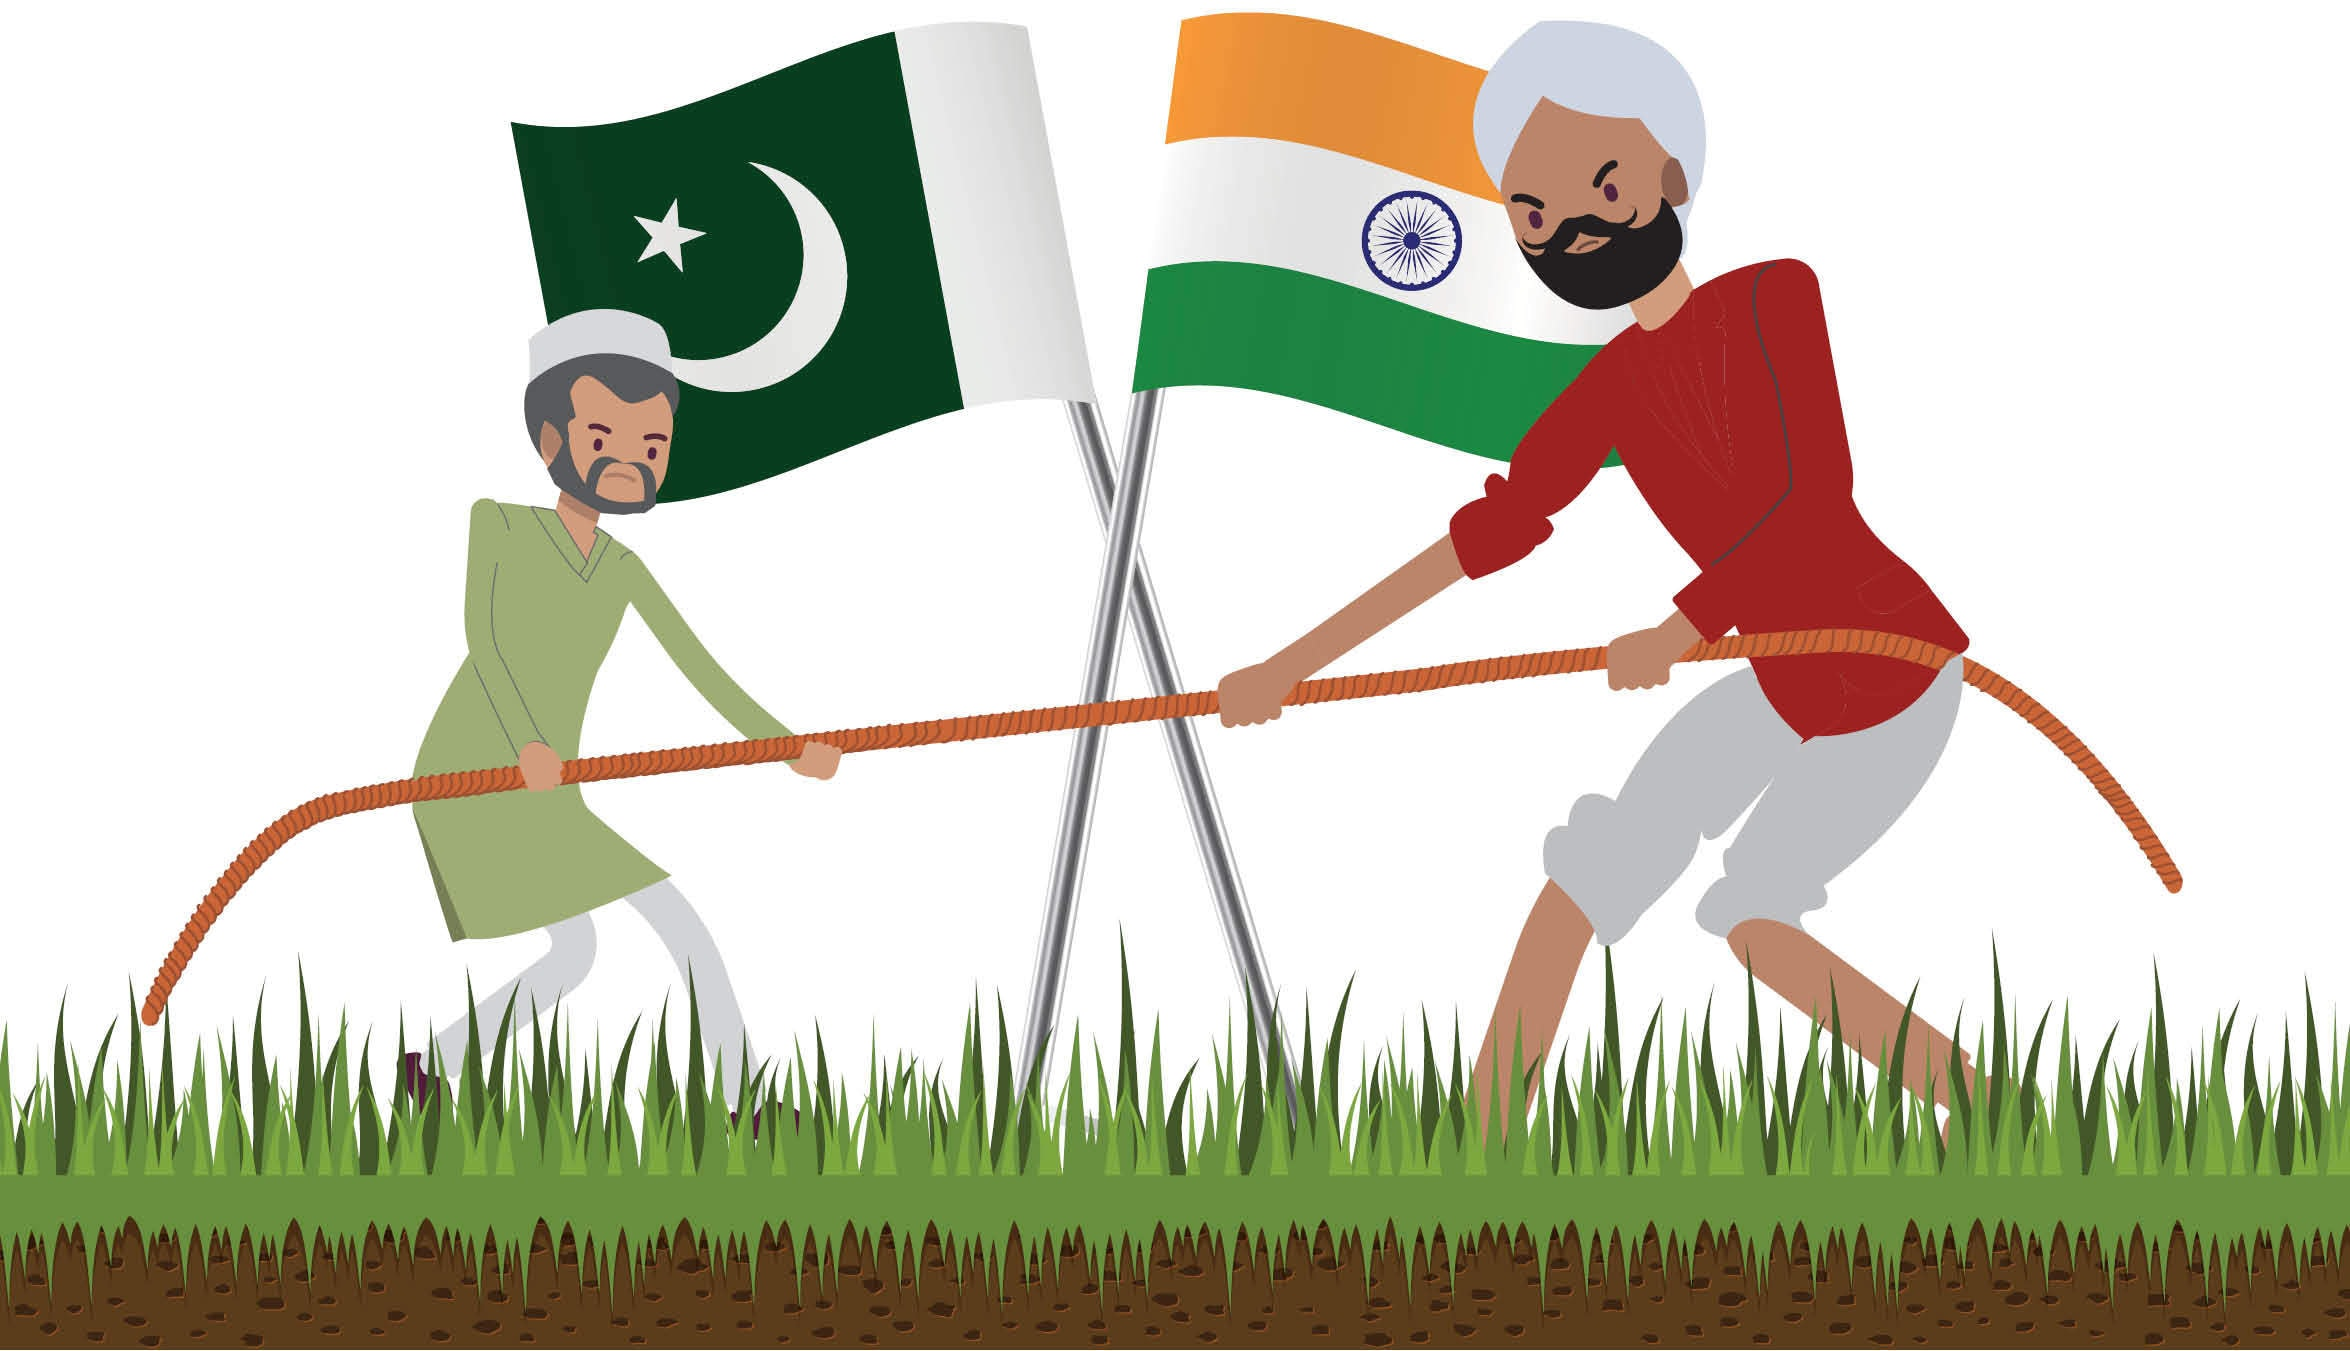 Illustration by Soonhal Khan